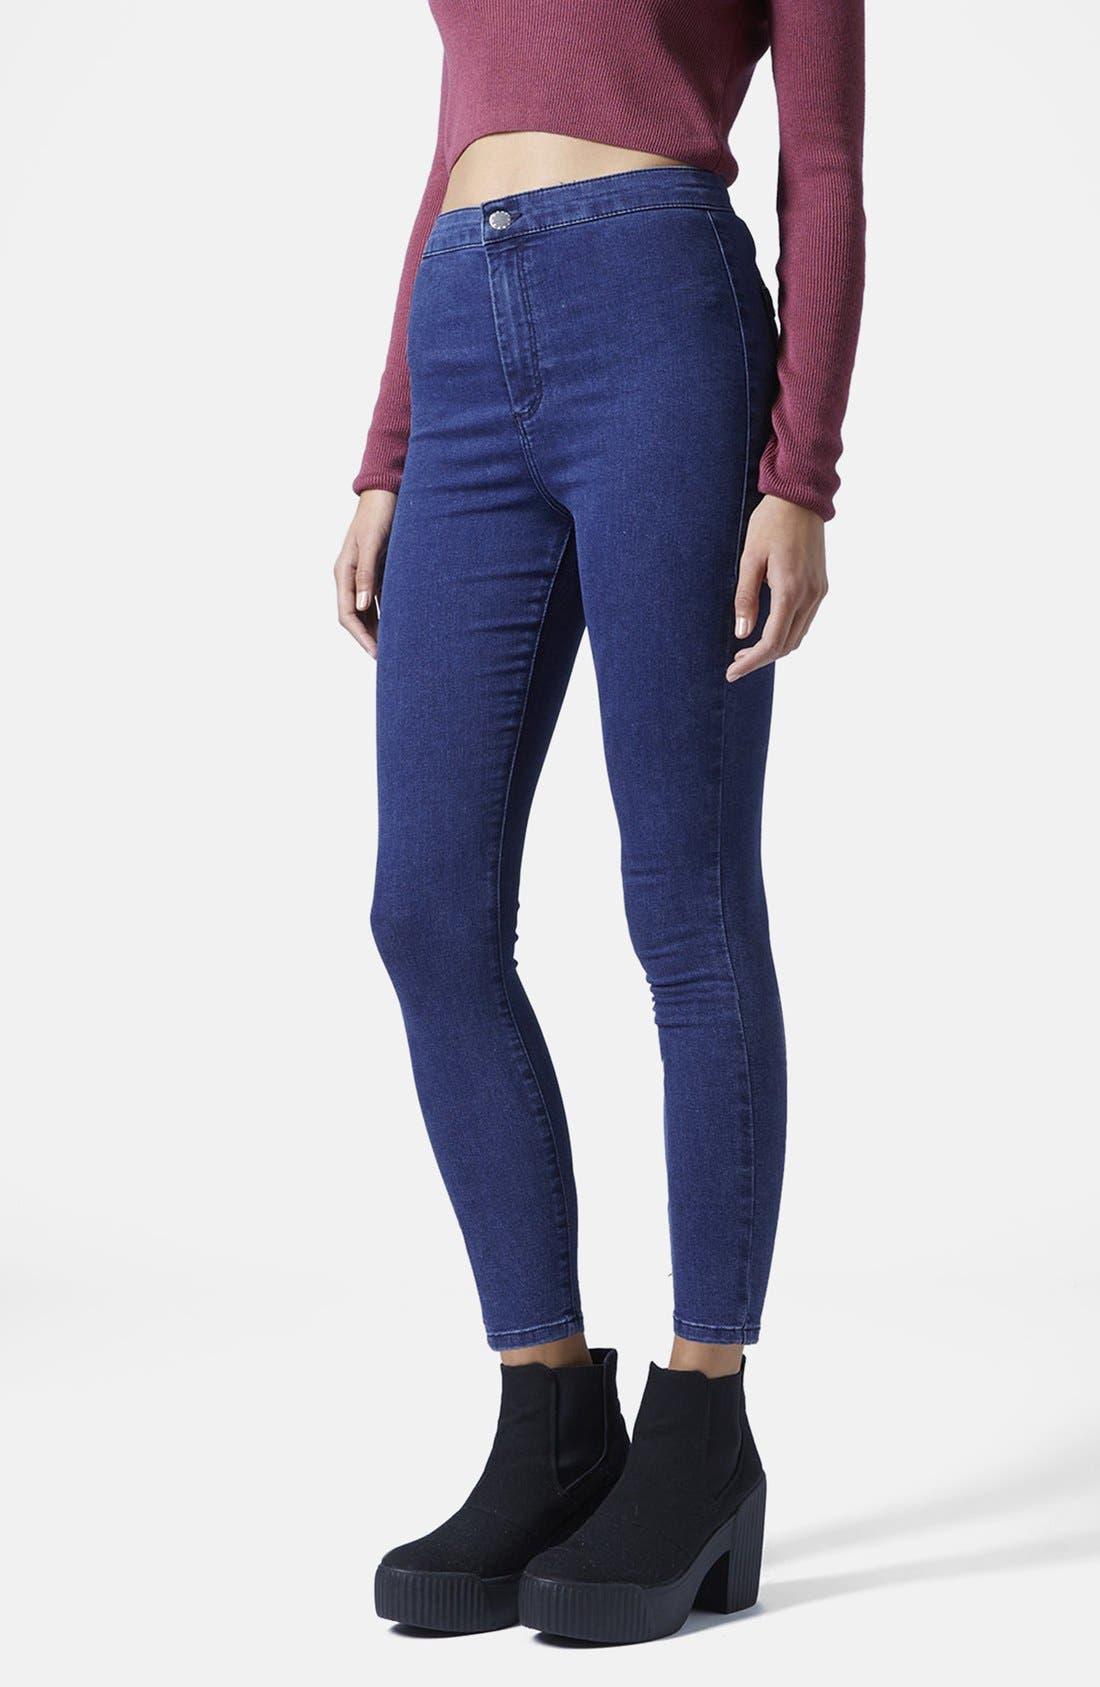 Alternate Image 1 Selected - Topshop Moto 'Joni' High Rise Skinny Jeans (Dark Stone)